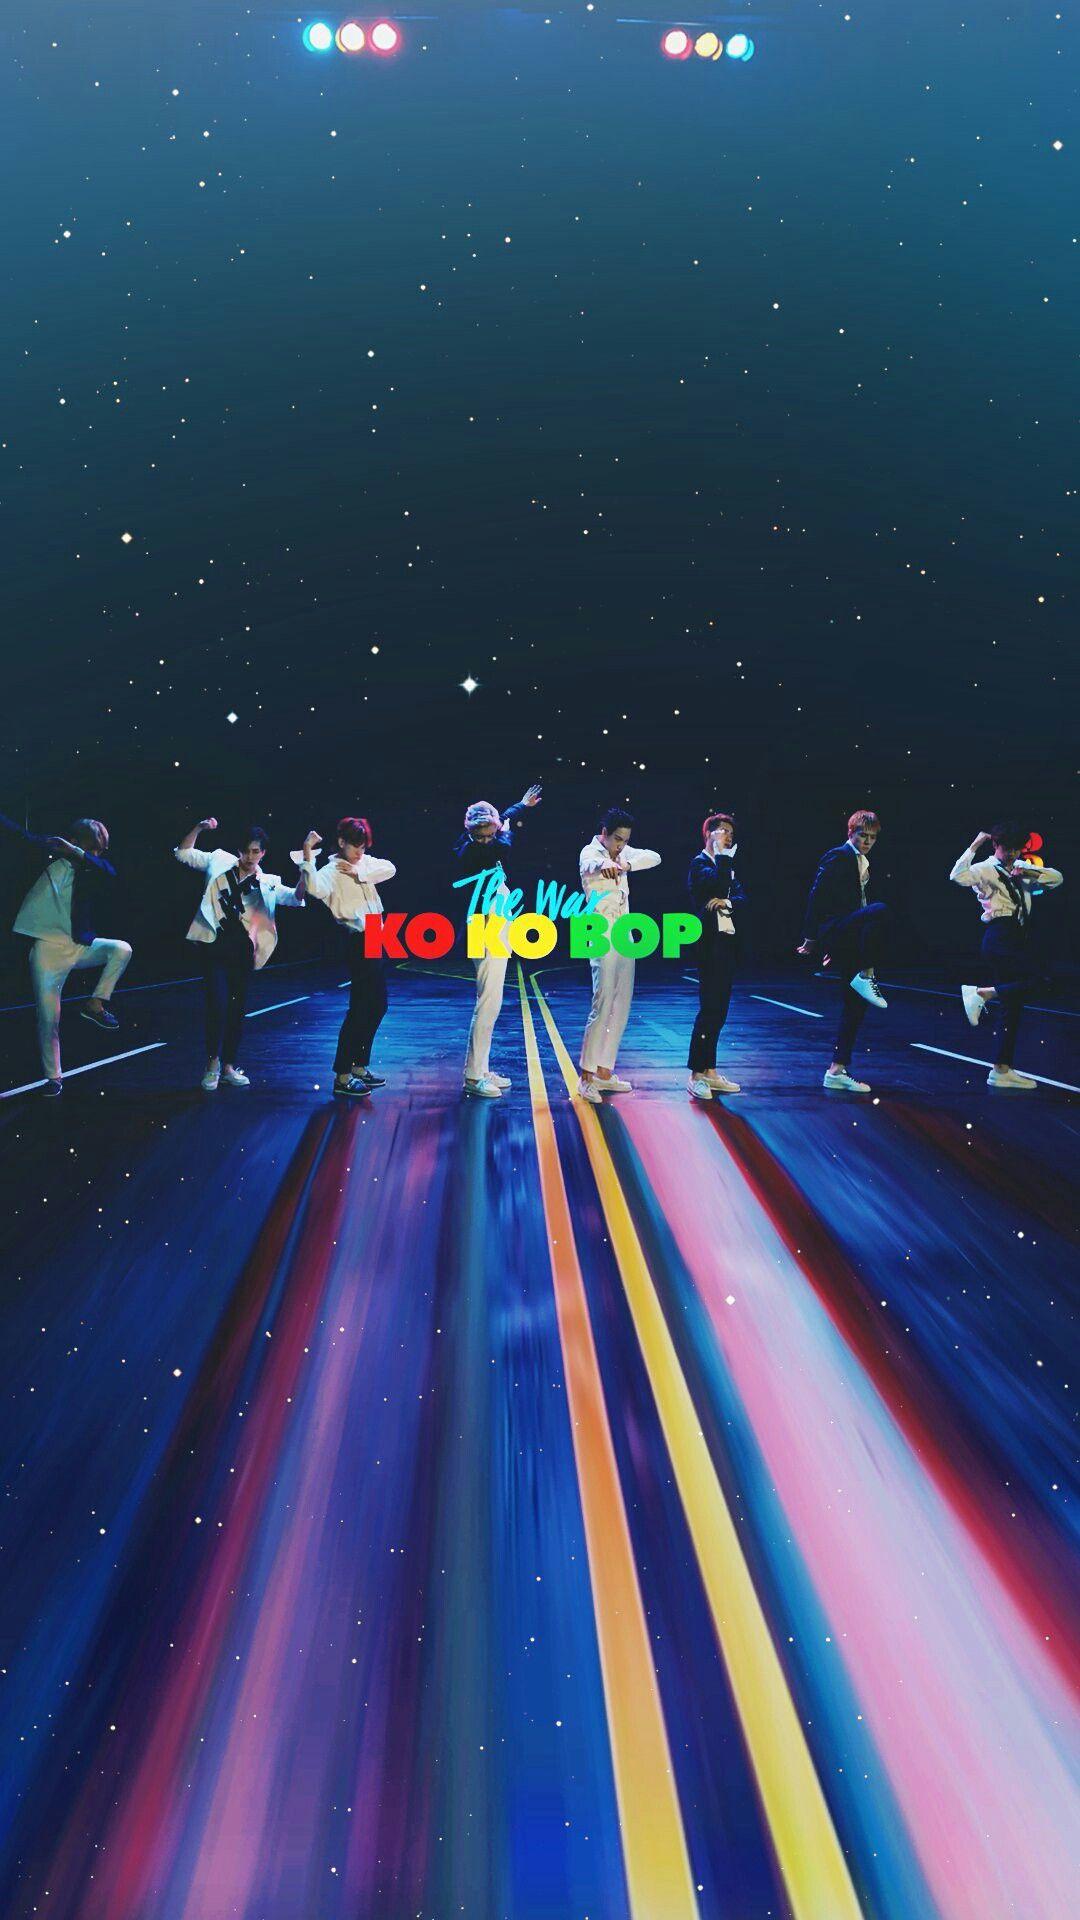 Exo kokobop thewar exo pinterest exo kpop and - Exo background ...